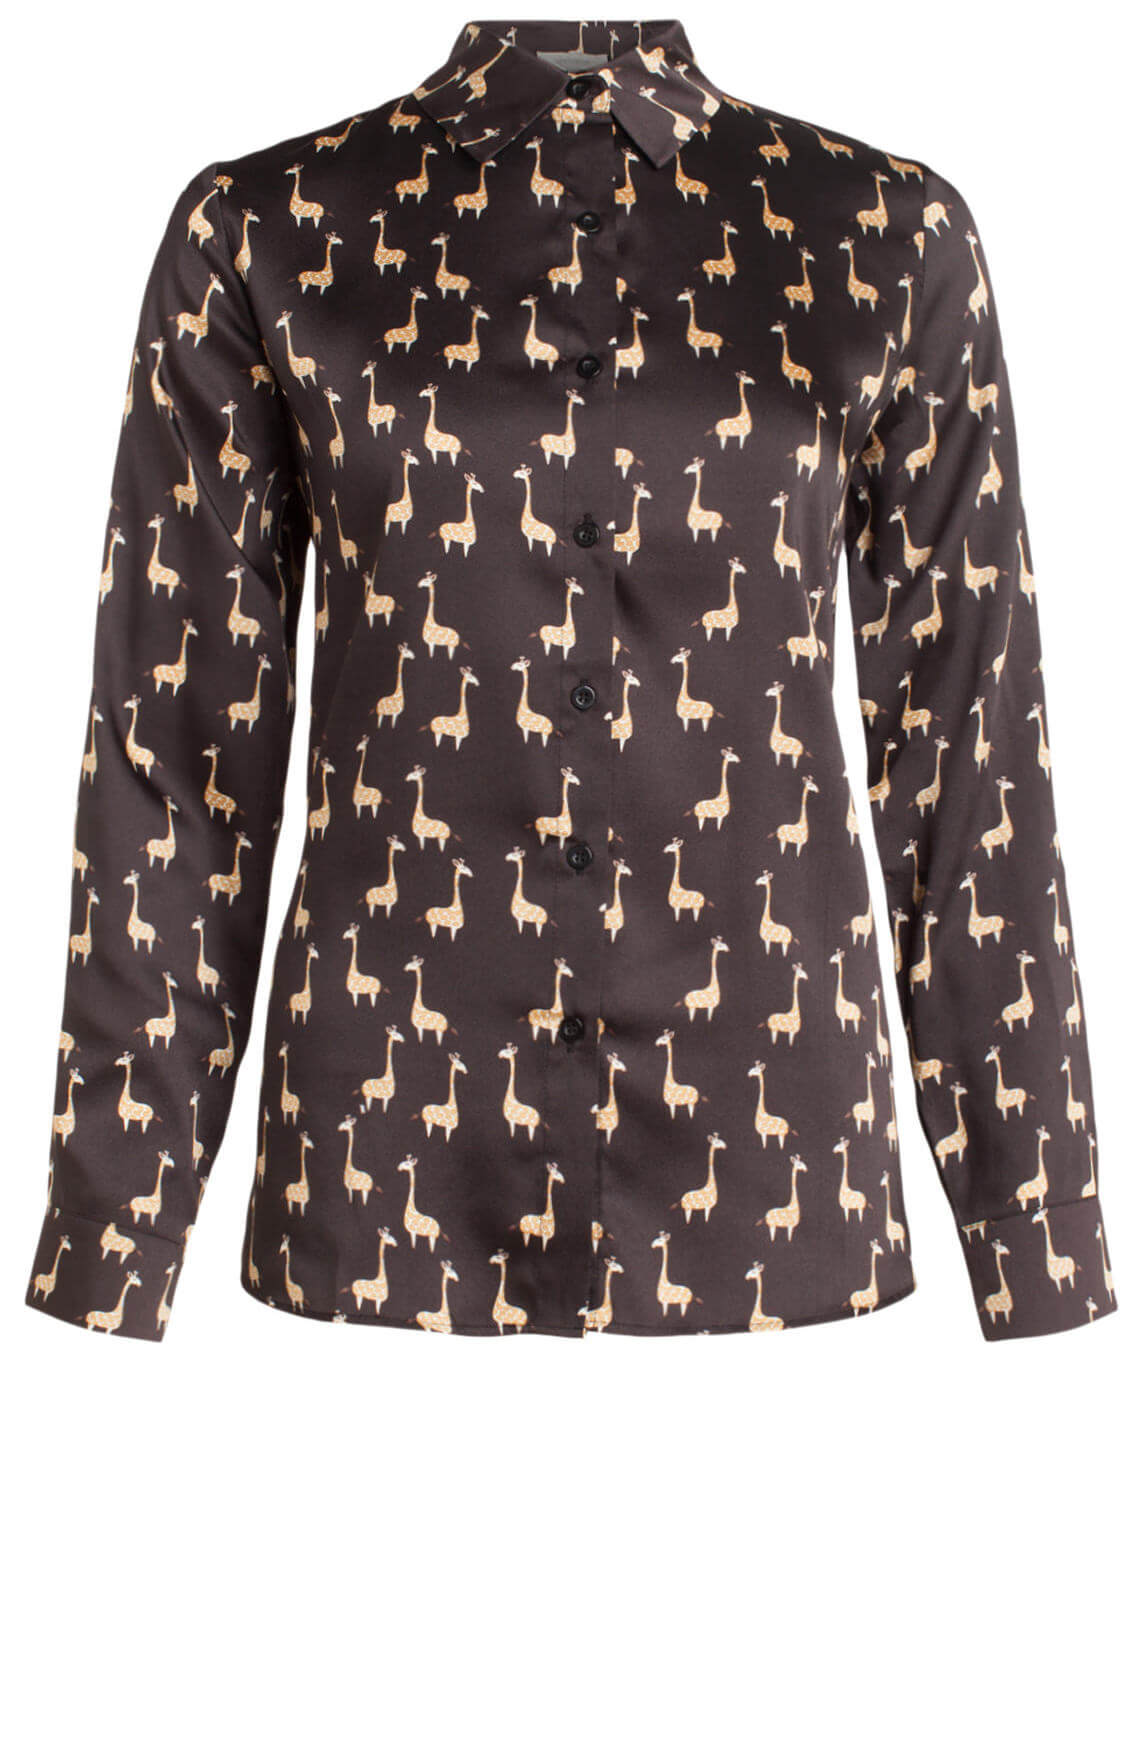 La Fée Maraboutée Dames Blouse met giraffe print zwart